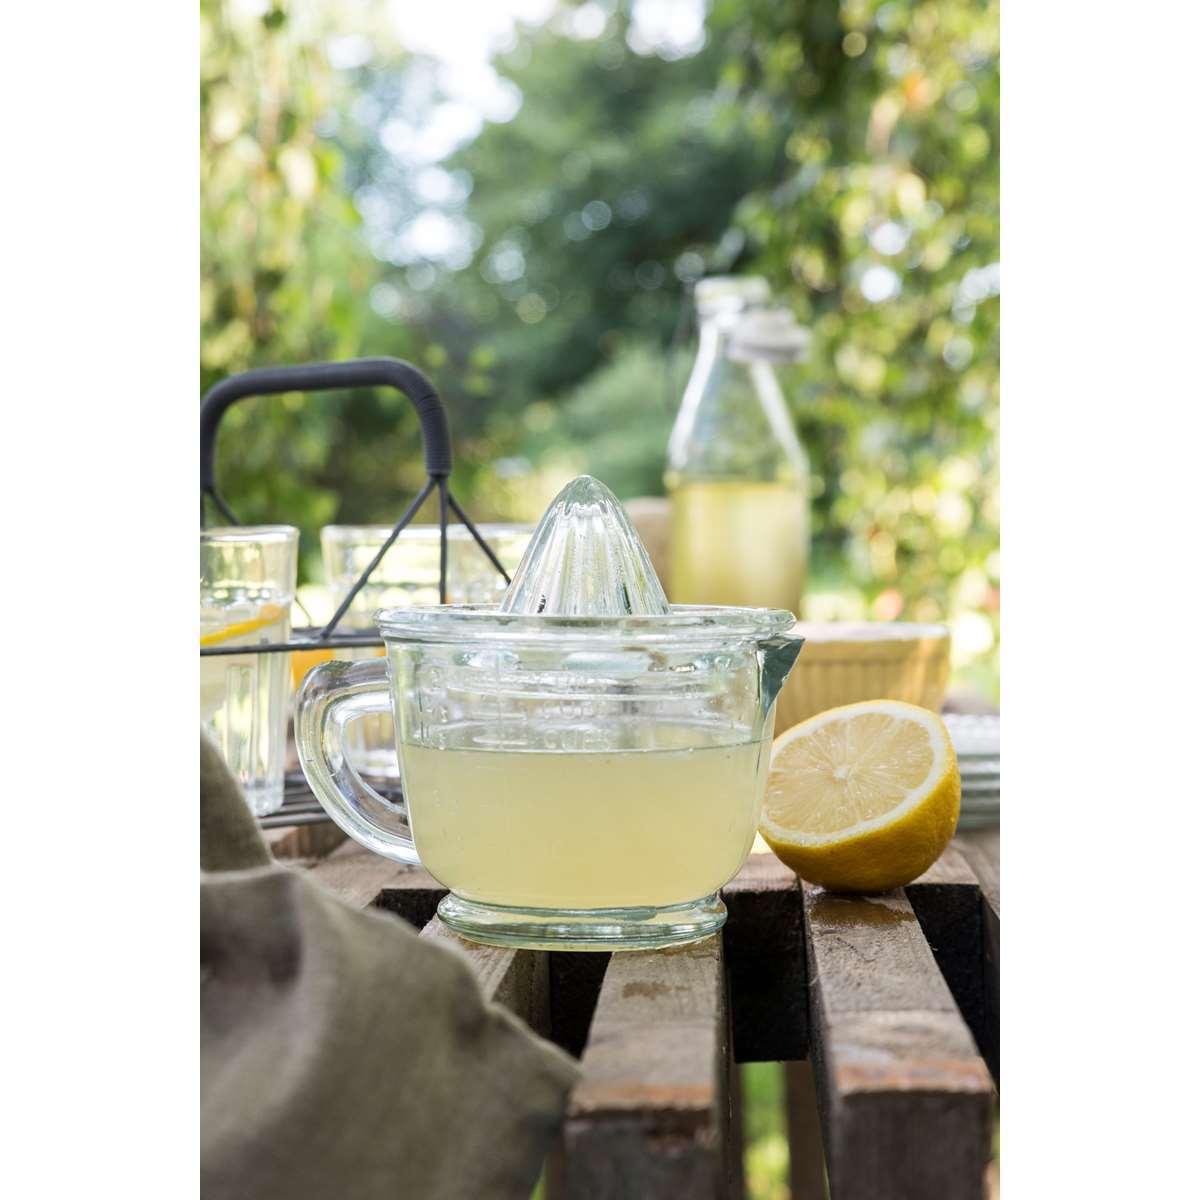 Zitronenpresse, Glas, 16x8x14 cm - Ib Laursen